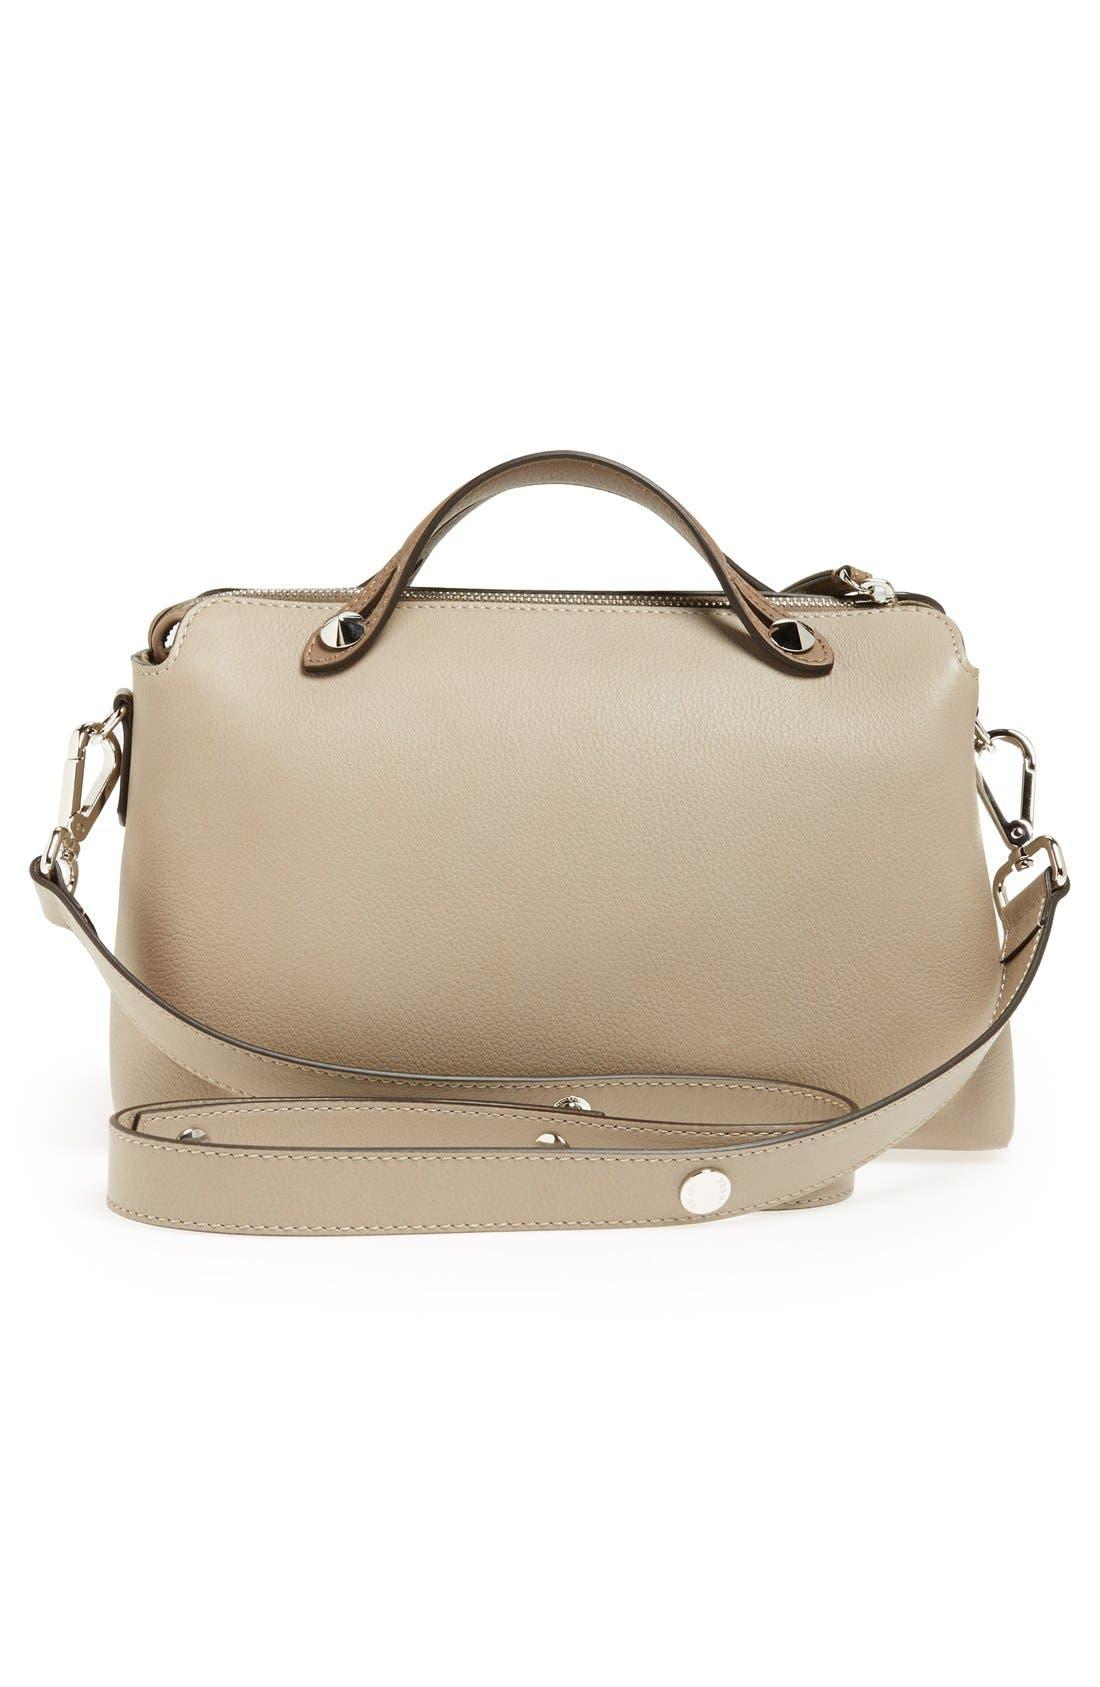 'Bauletto Piccolo' Leather Crossbody Bag,                             Alternate thumbnail 4, color,                             Turtledv Sepia Palladuim